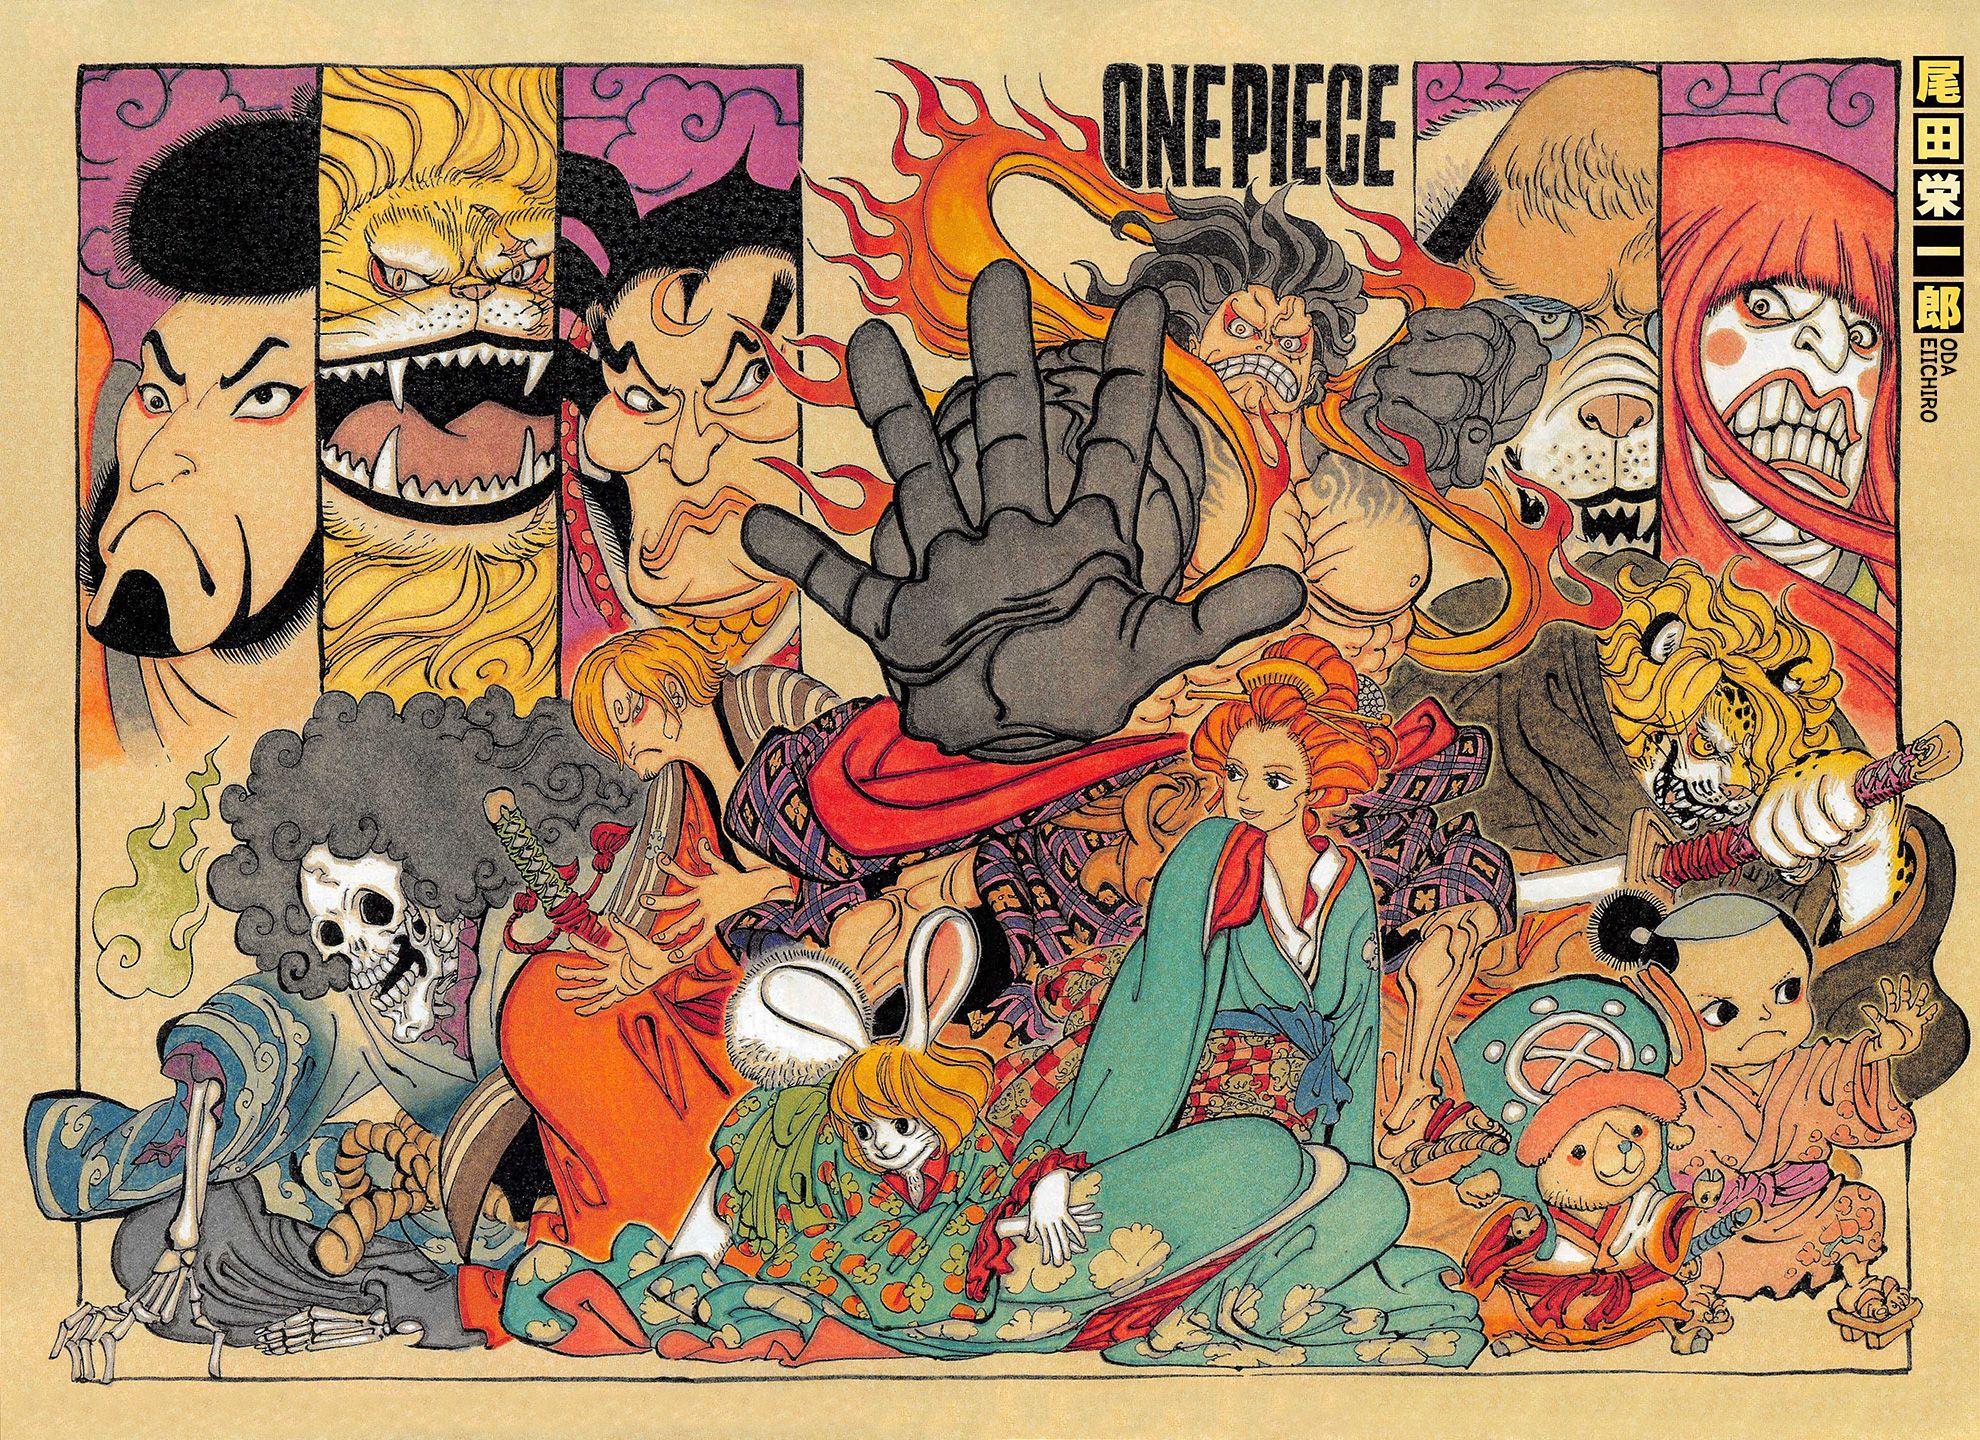 One Piece   วันพีช   One piece comic, One piece manga, One